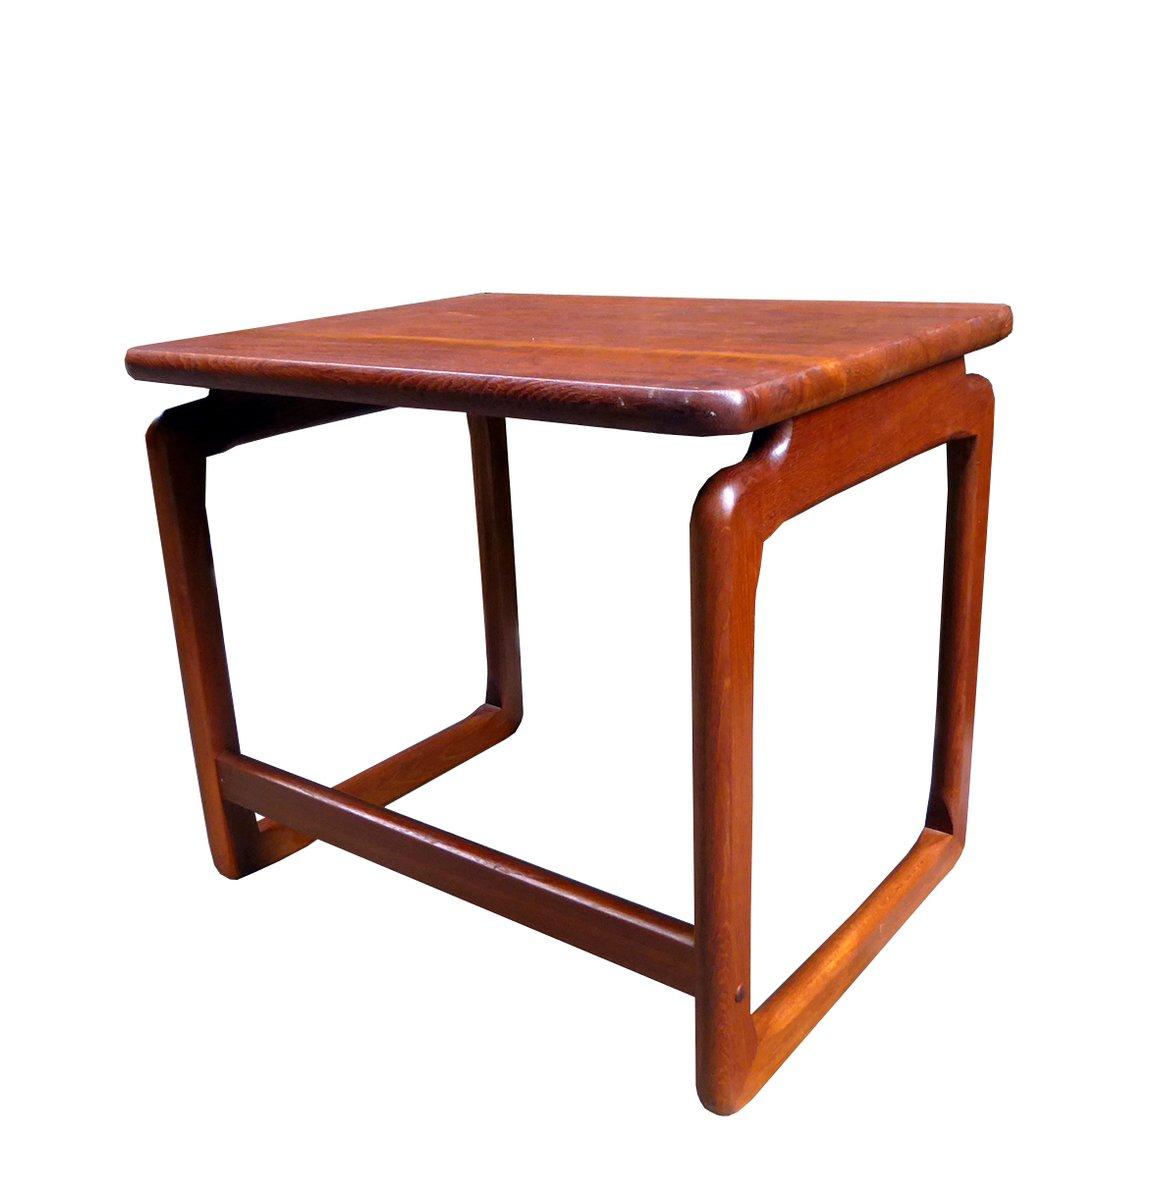 Danish teak coffee table 1950s for sale at pamono for Teak coffee table